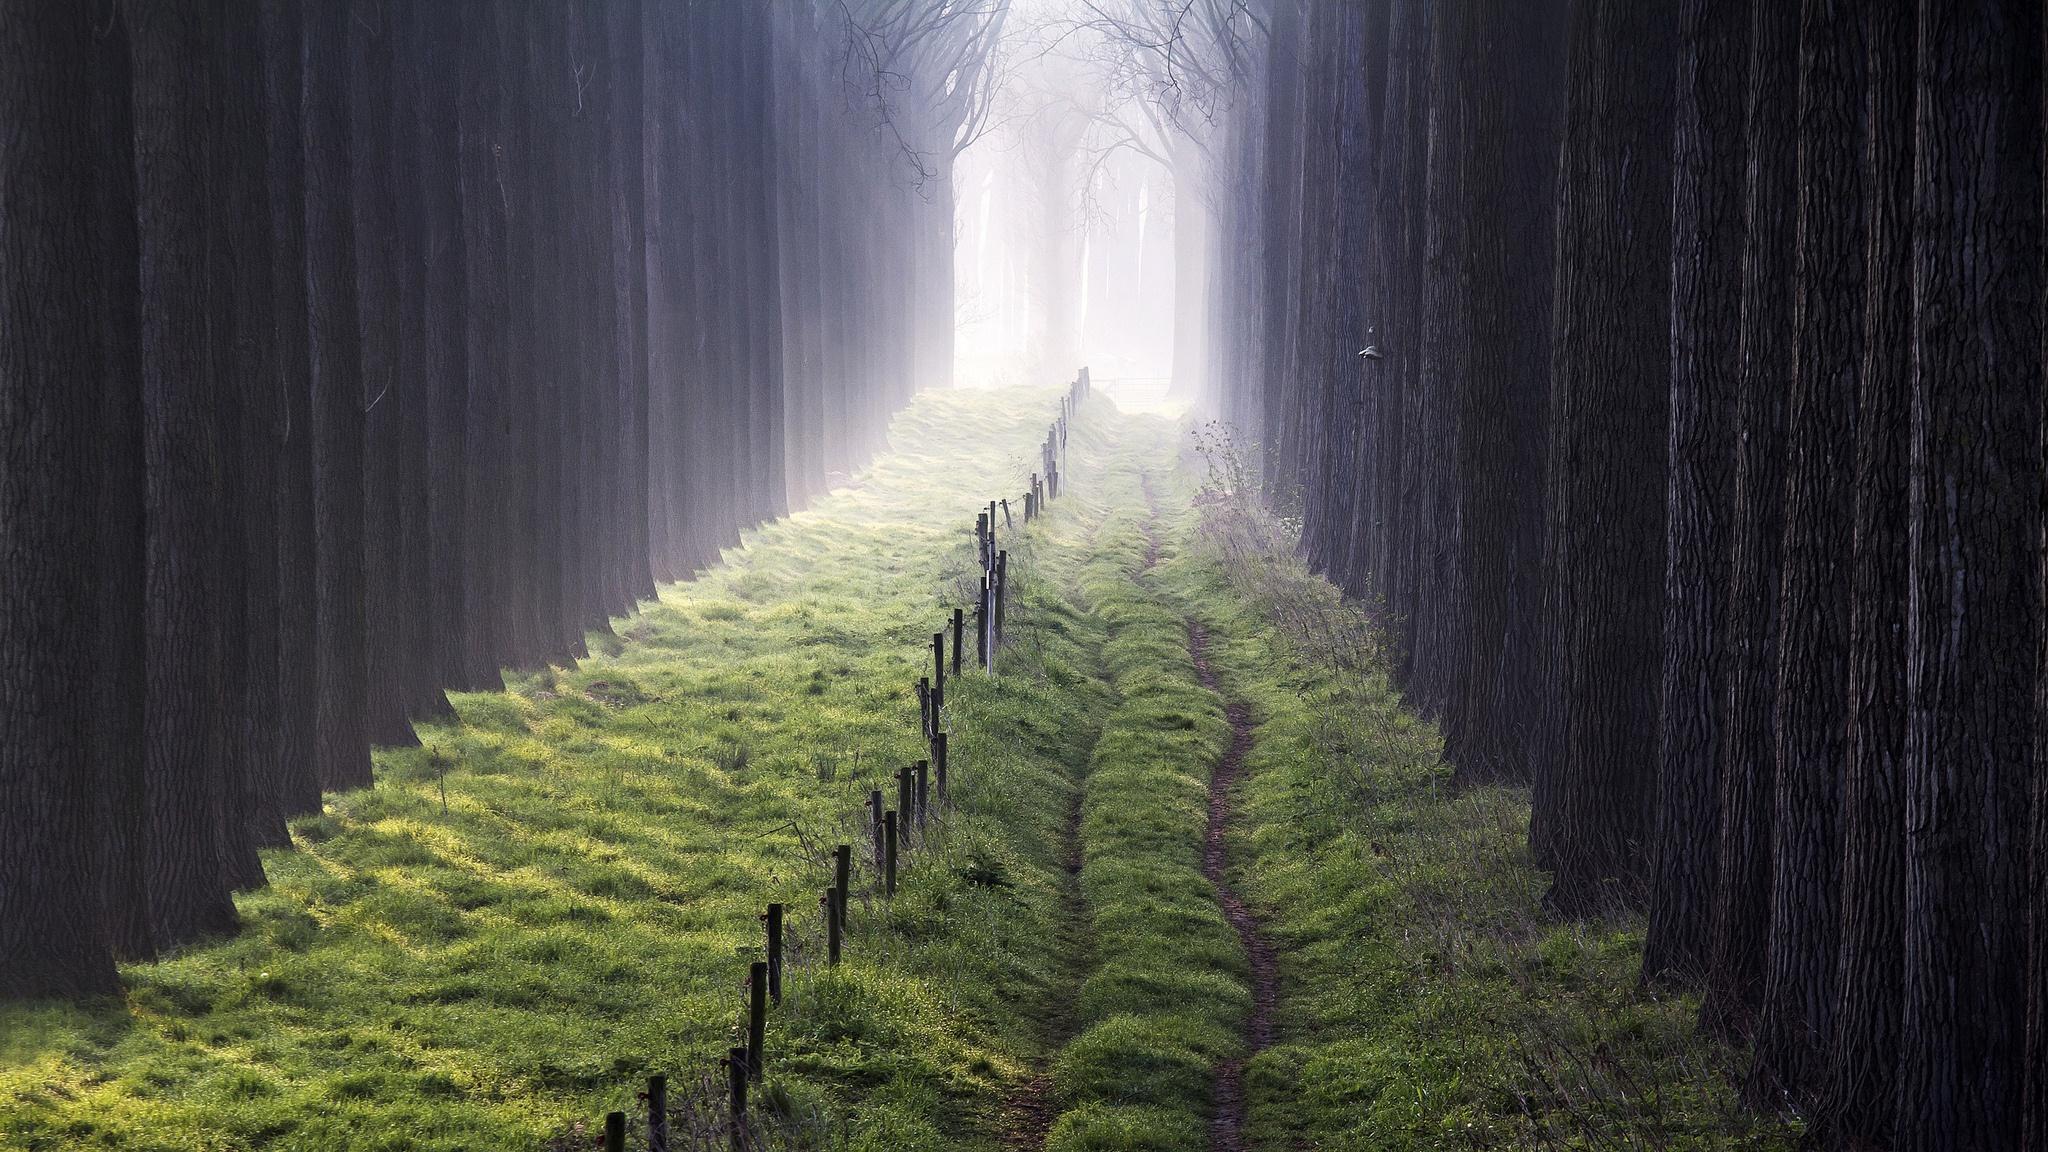 Trees Plants Outdoors Grass Mist 2048x1152